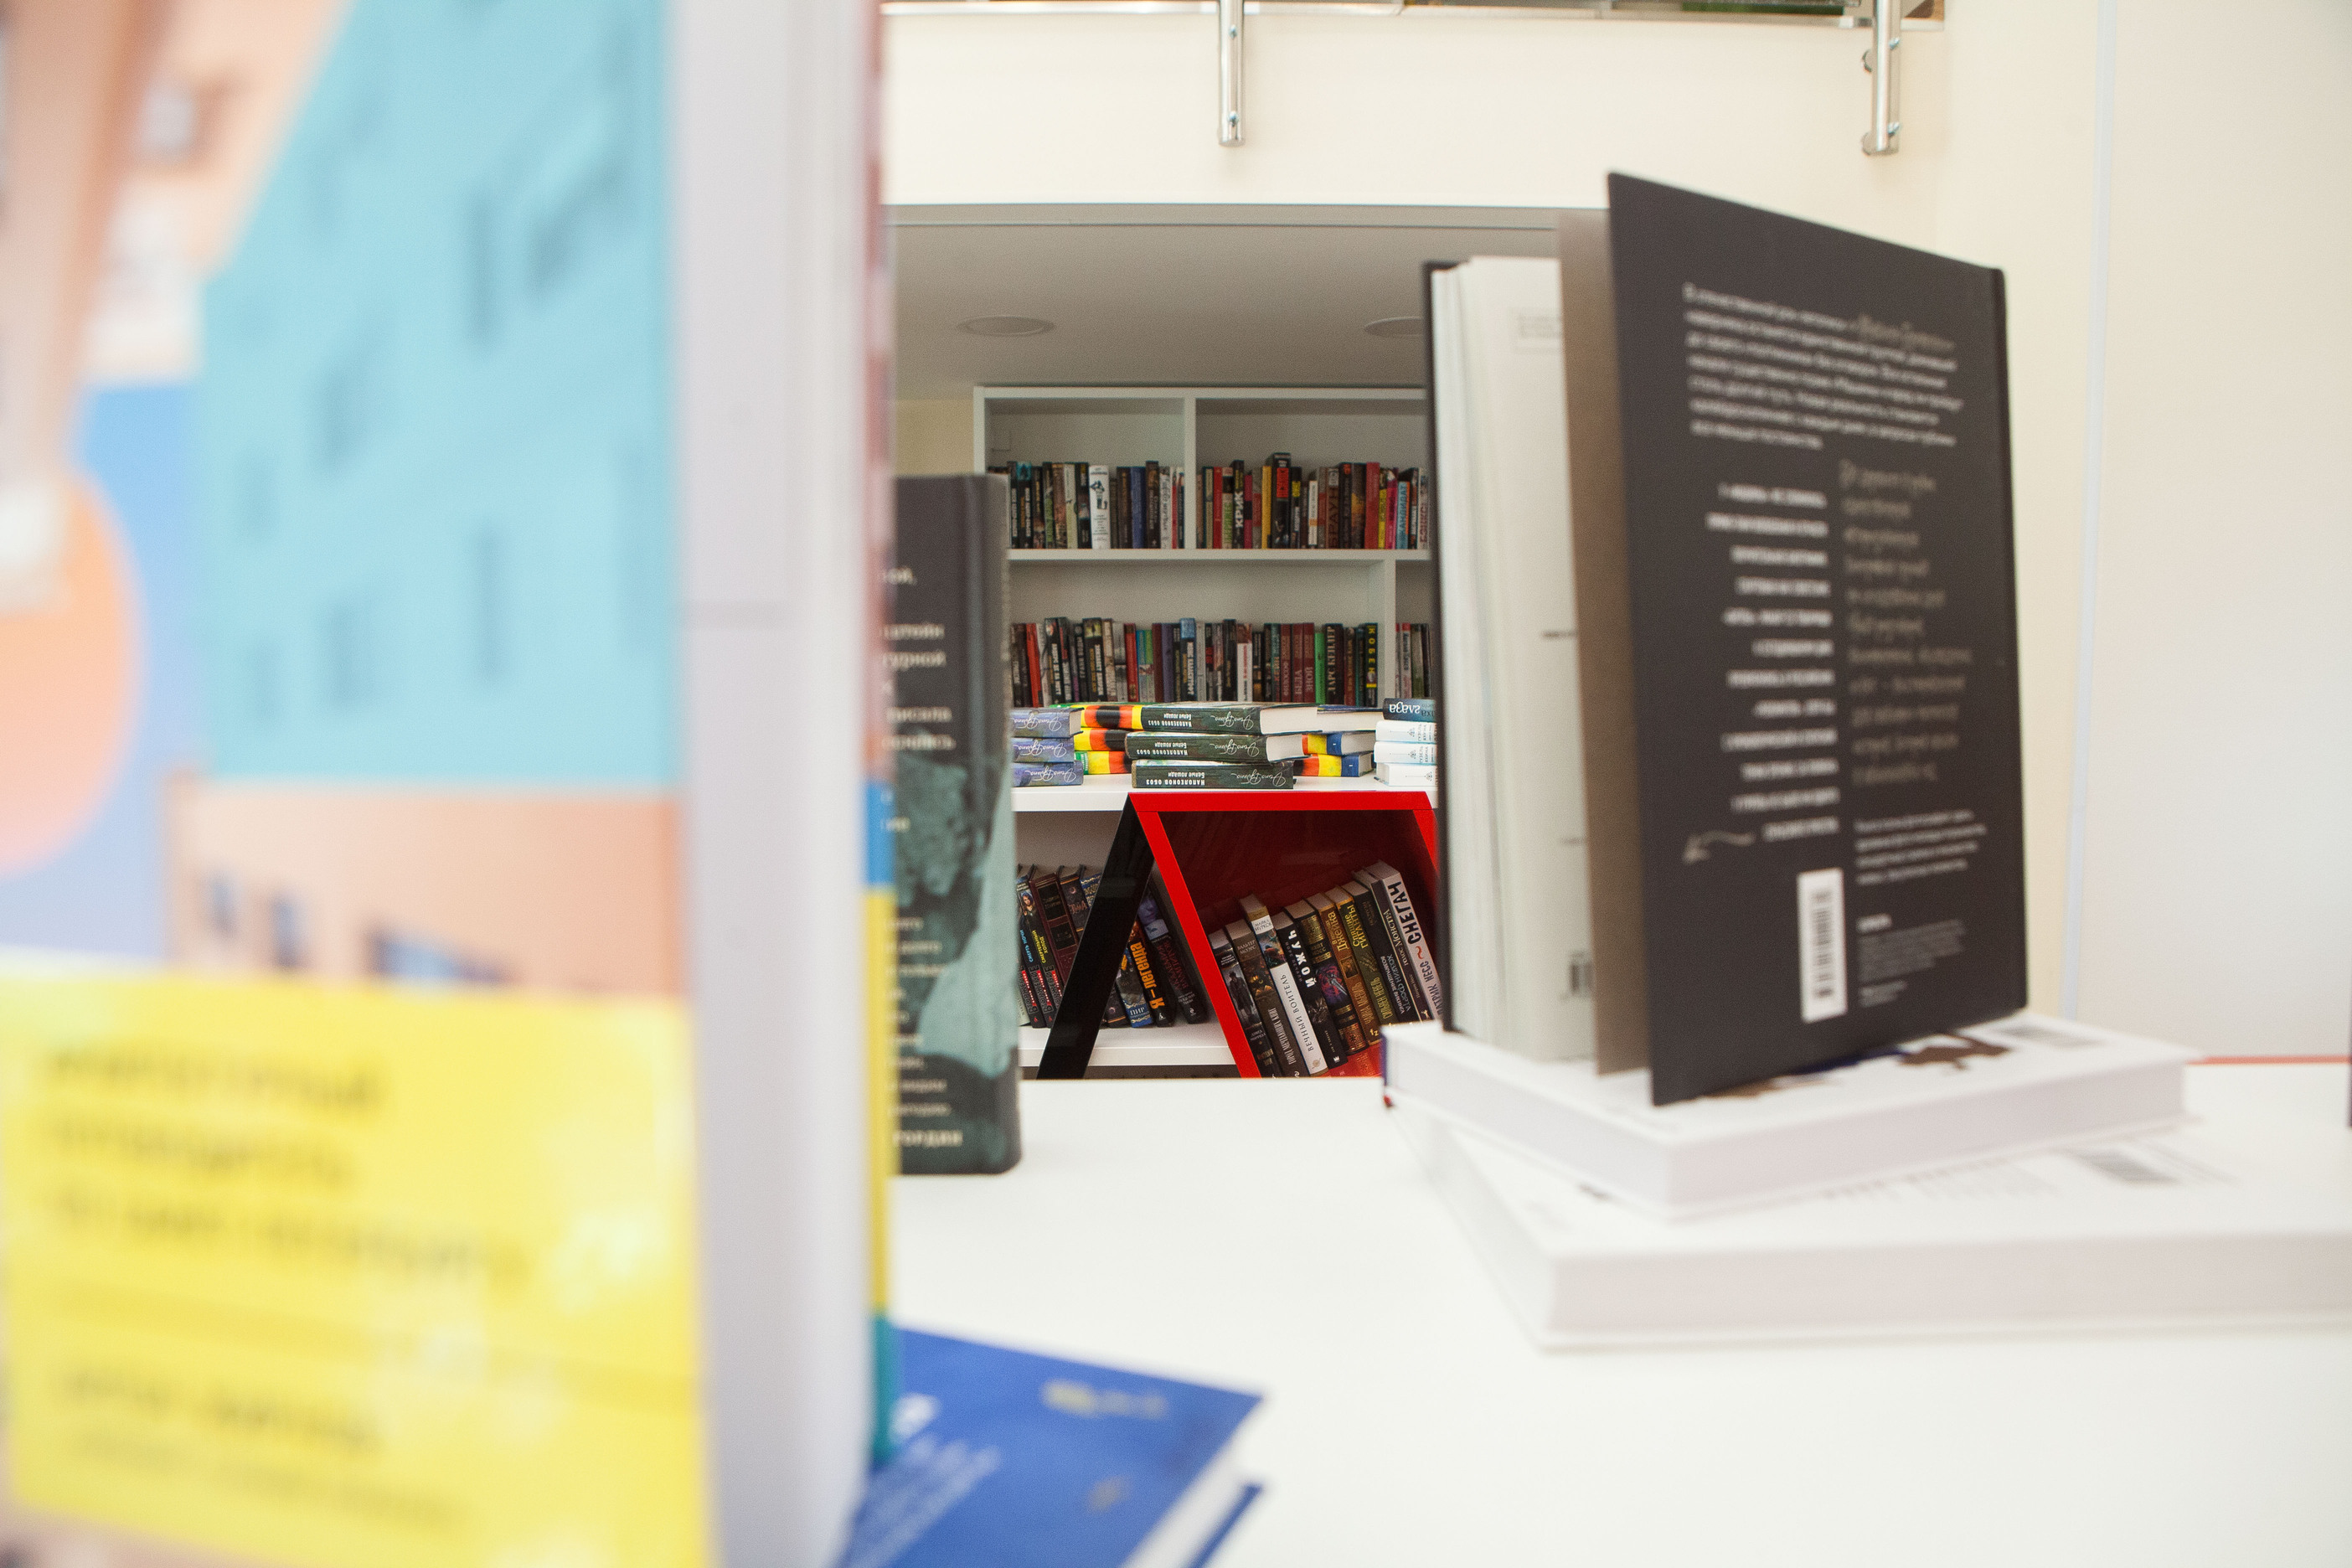 библиотека, библиотека Ленина, книги, креативное пространство